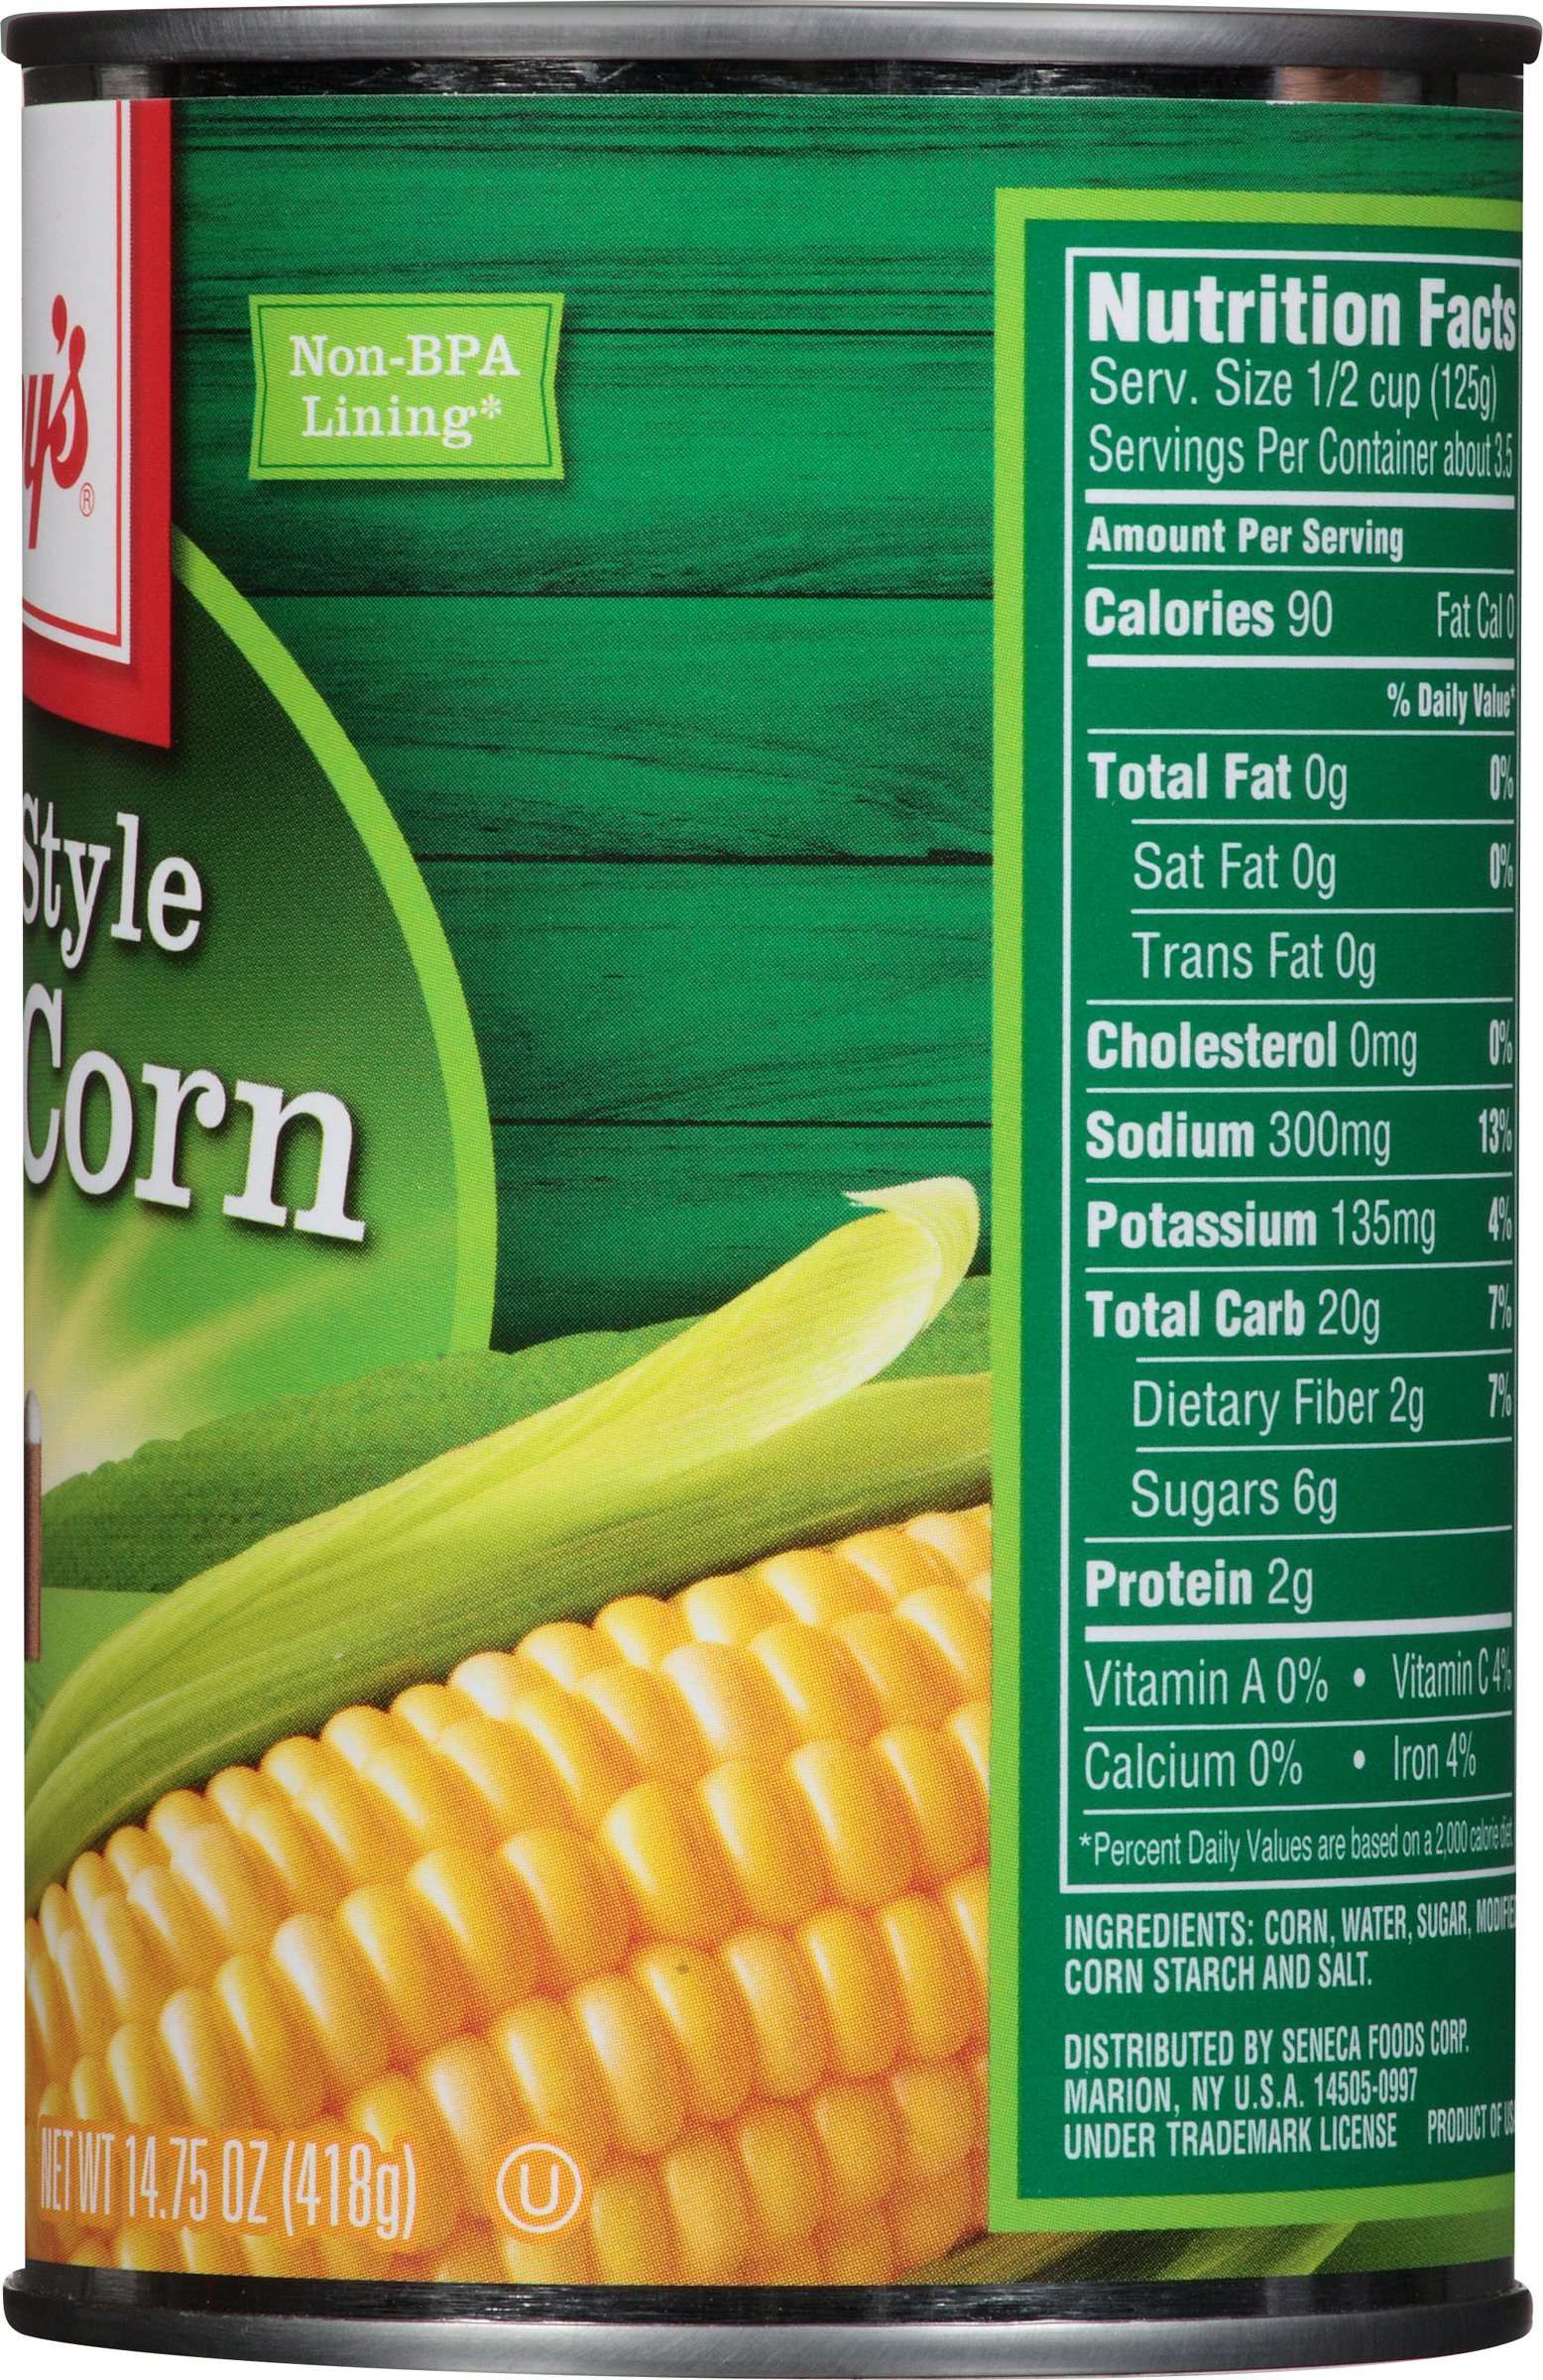 libby's® cream style sweet corn 14.75 oz. can - walmart